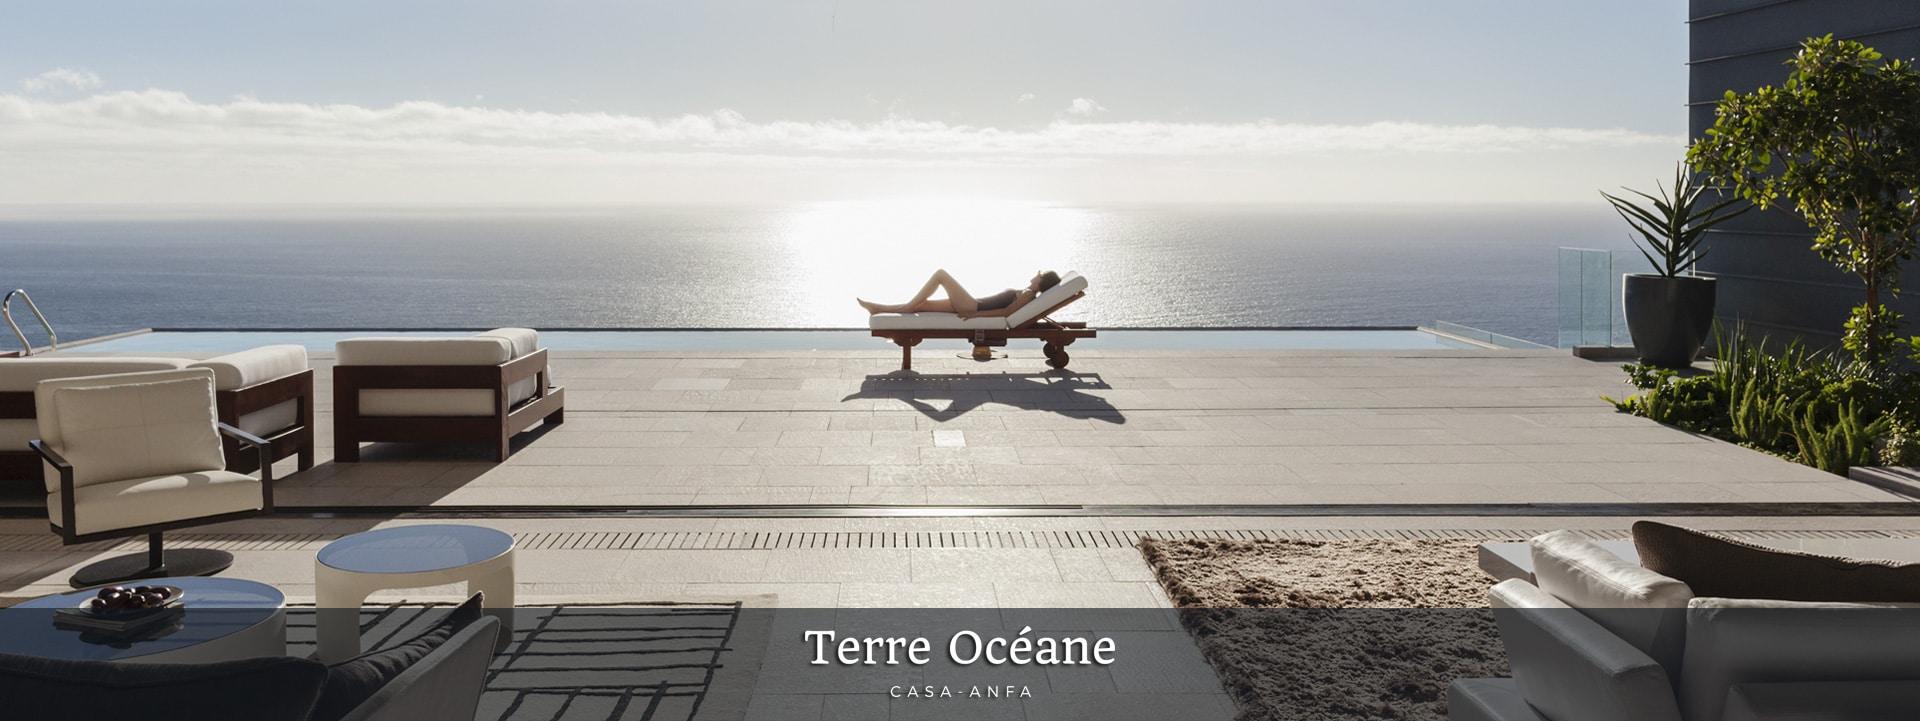 Yamed Promotion - Terre Océane